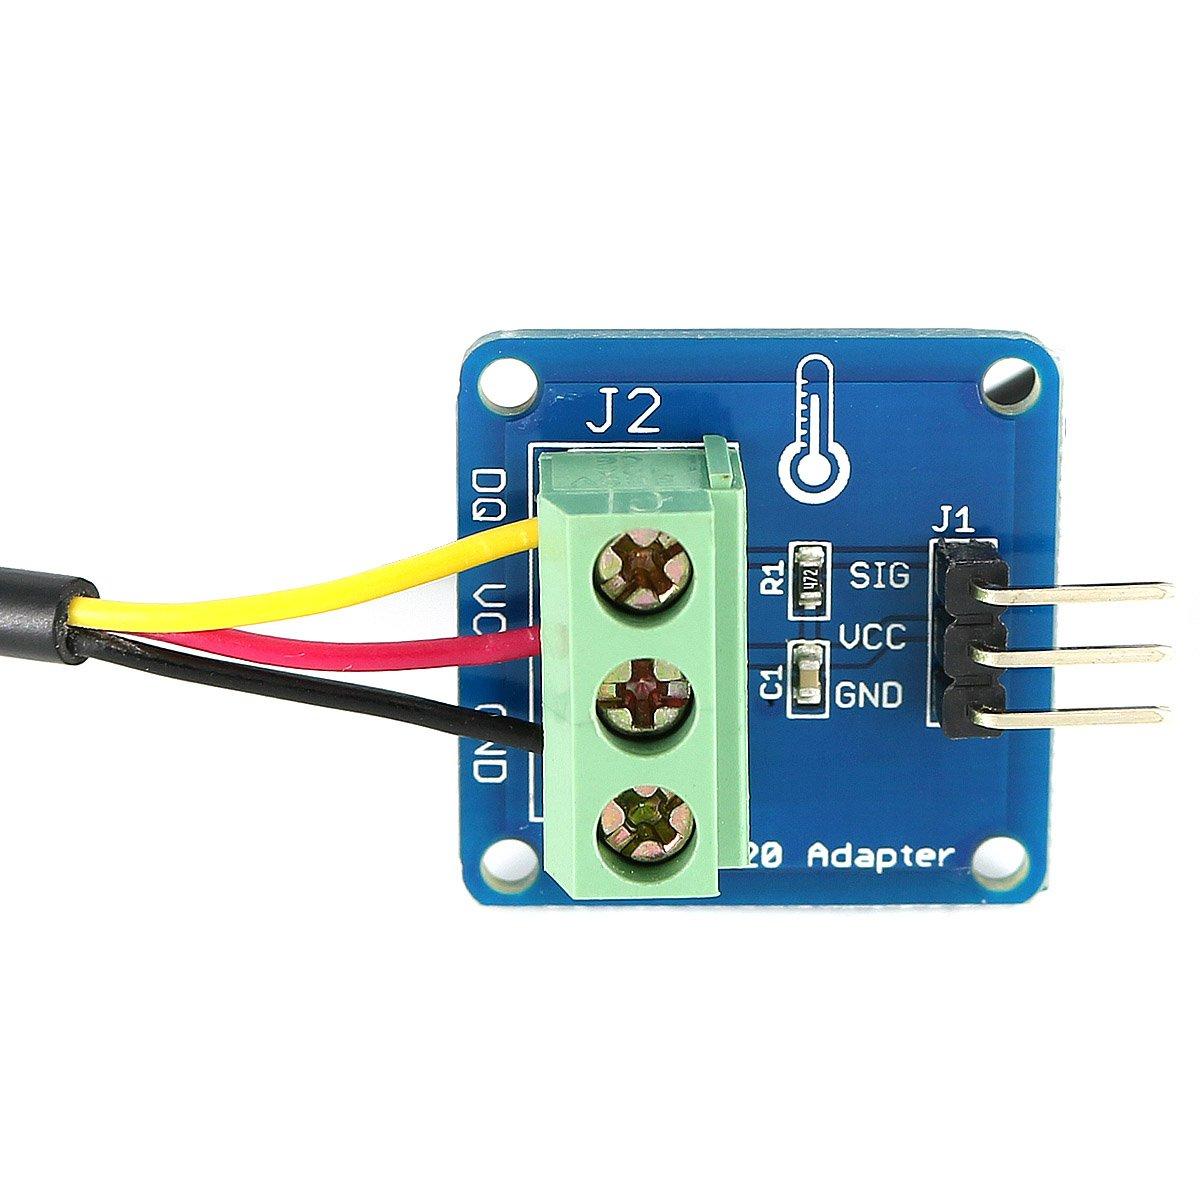 Waterproof DS18B20 Digital Temperature Sensor and DS18B20 Adapter ...